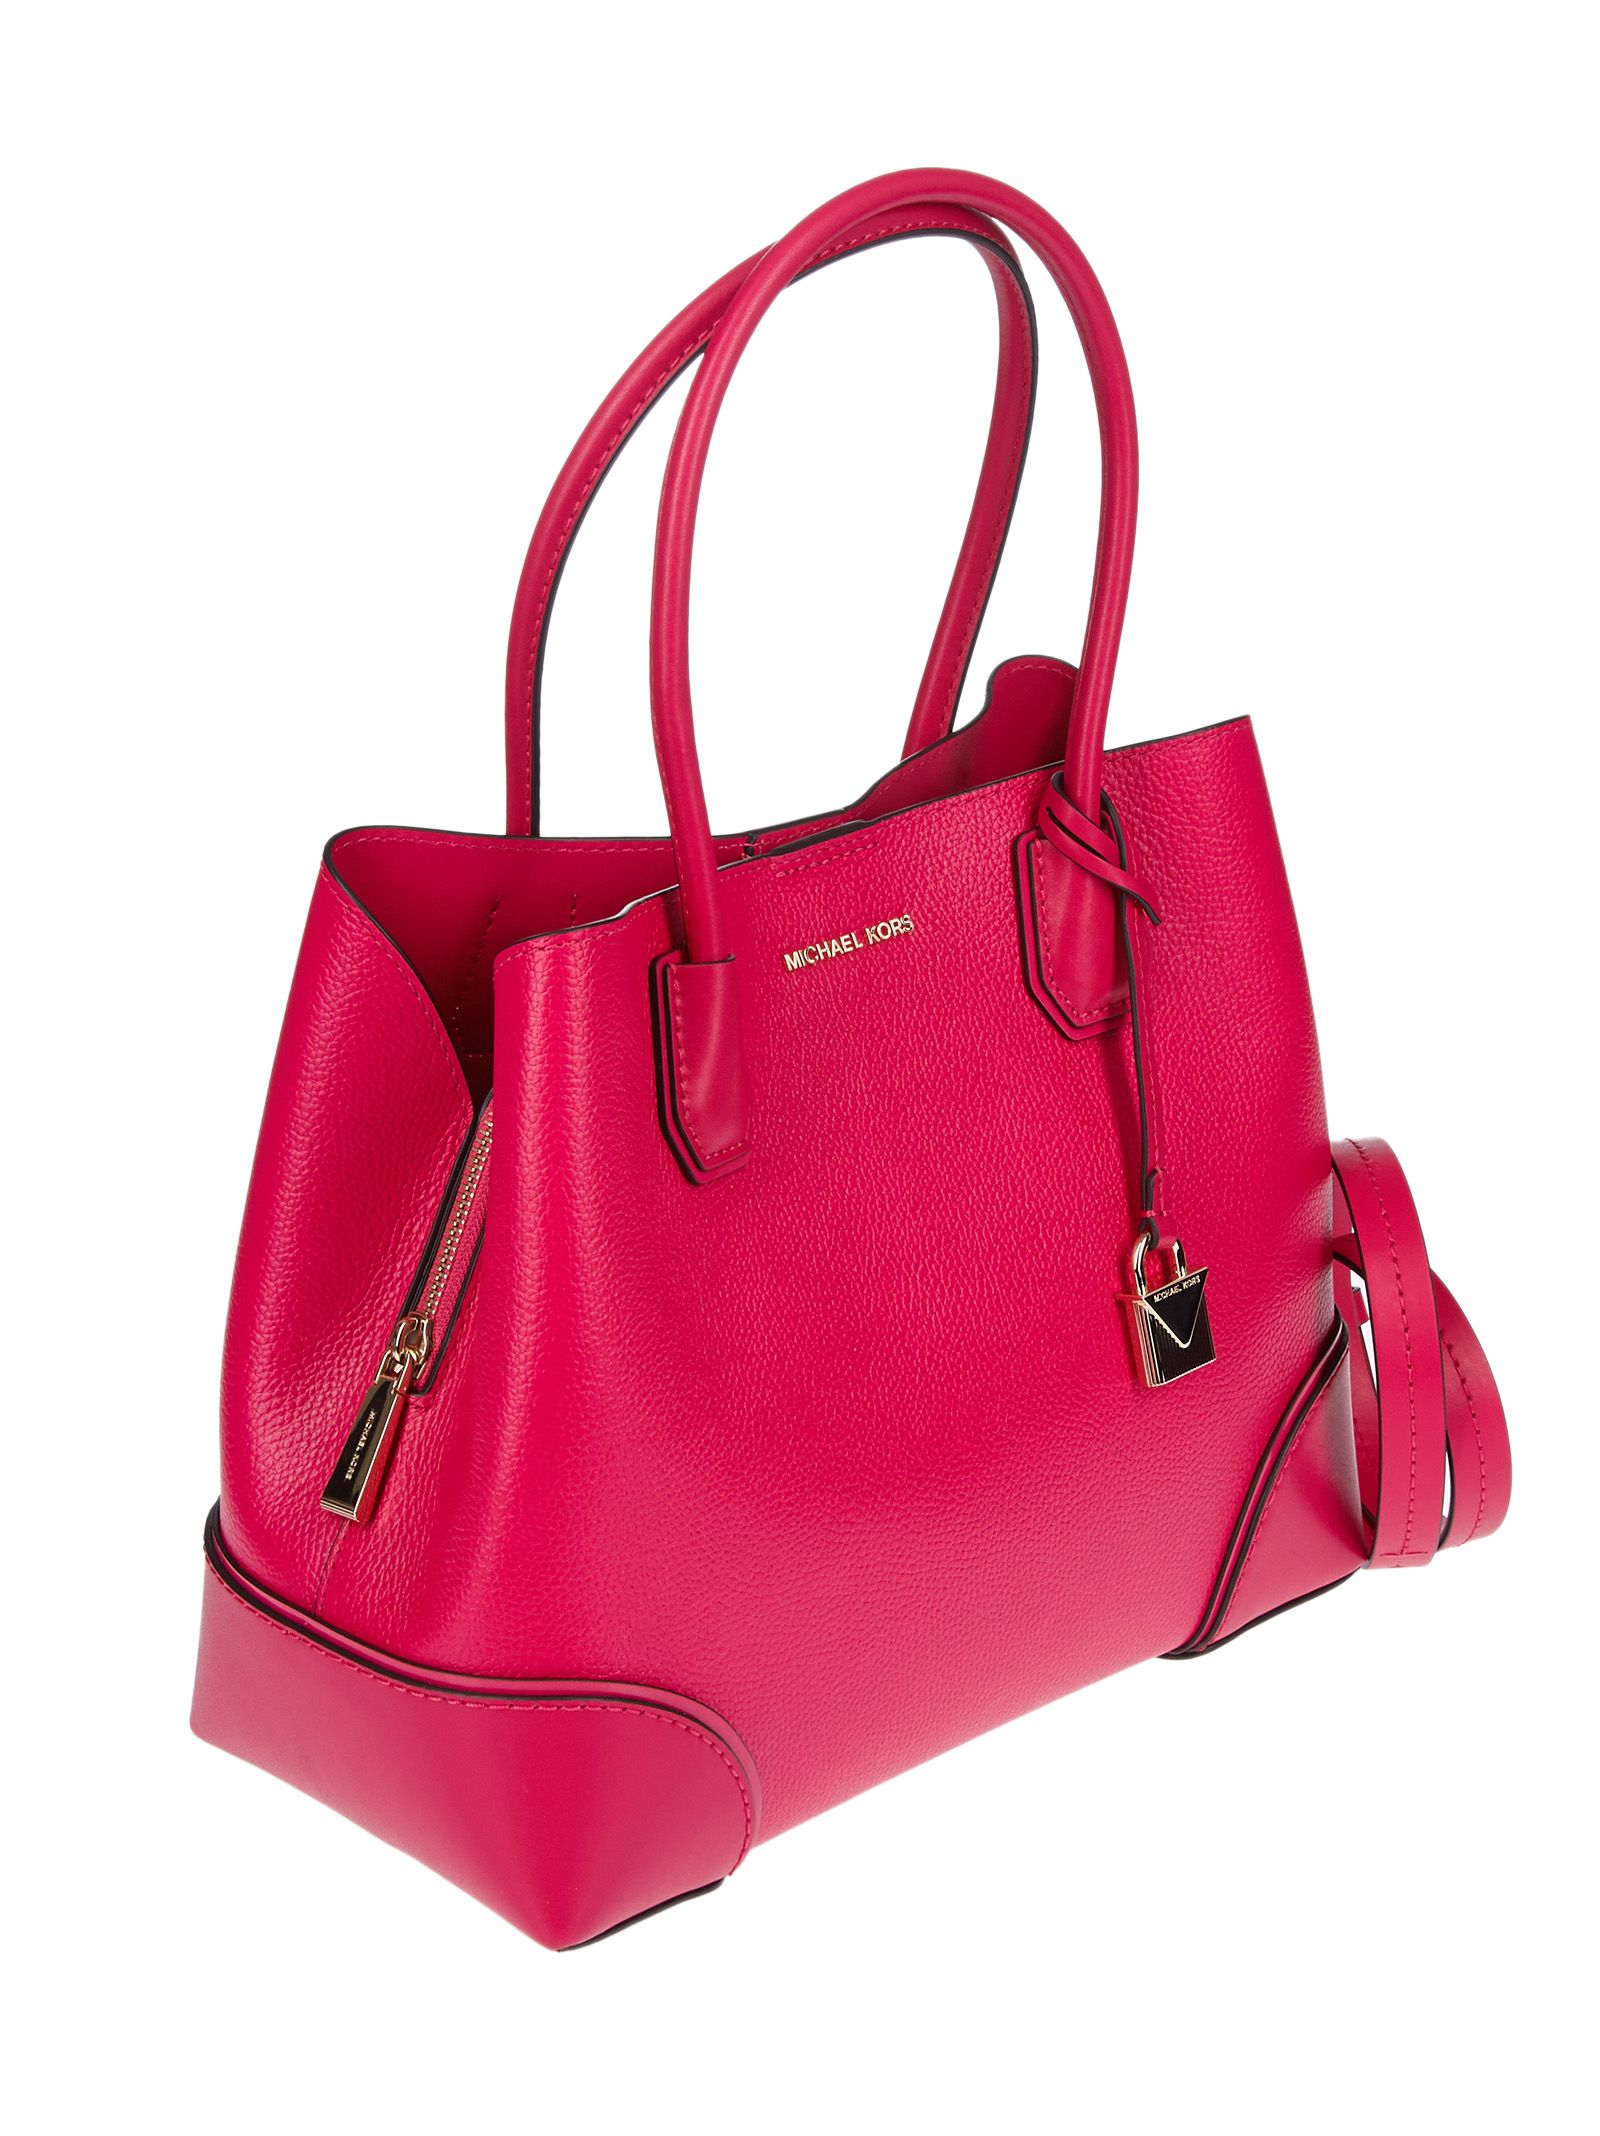 VIDA Statement Bag - Luminescent Floral Red by VIDA scSccW